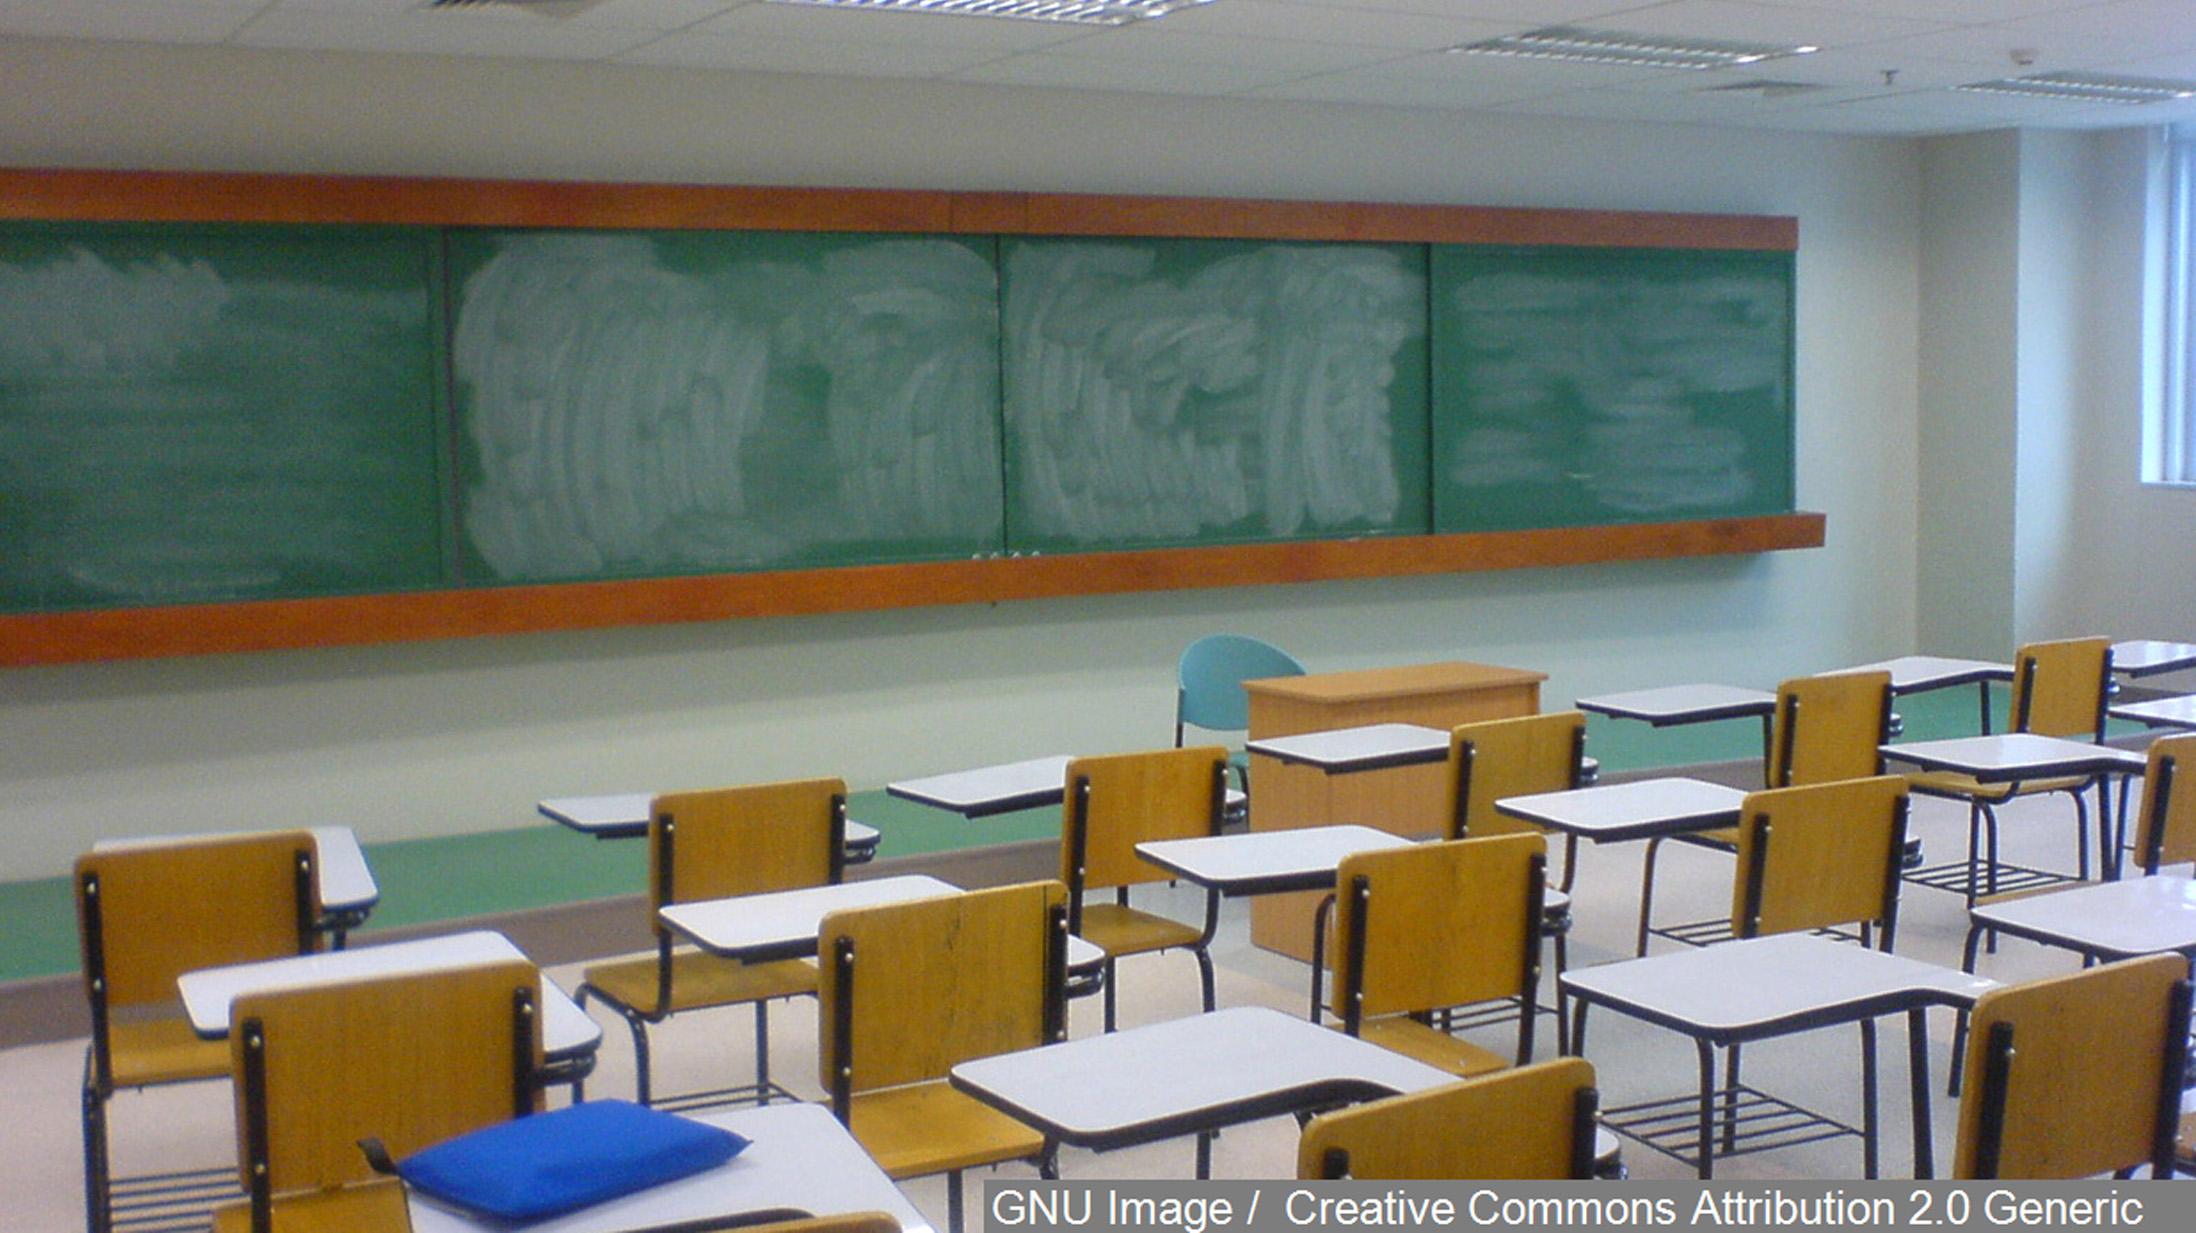 Classroom 10122015_1458187234683.jpg